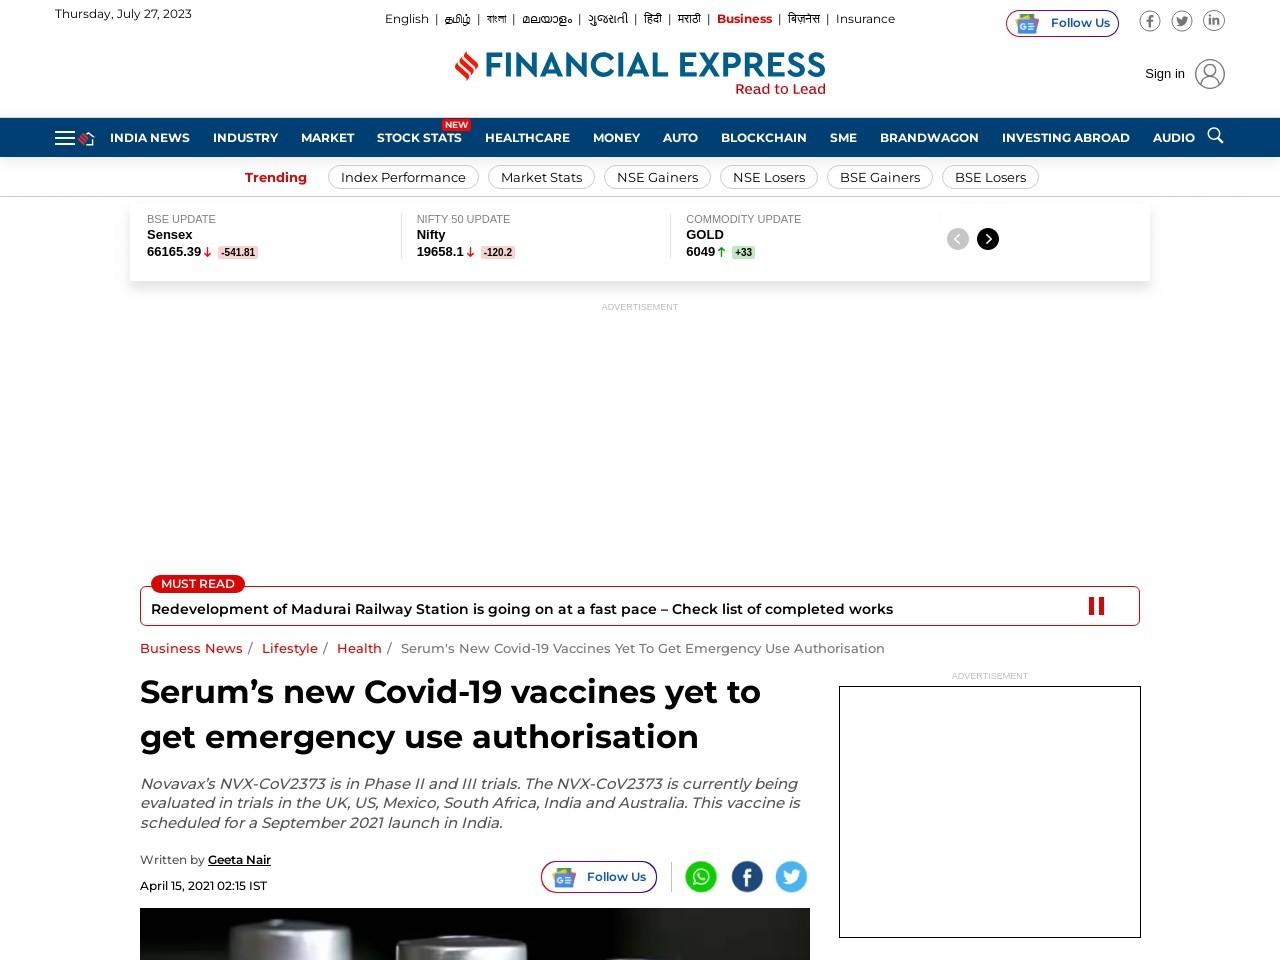 Serum's new Covid-19 vaccines yet to get emergency useauthorisation